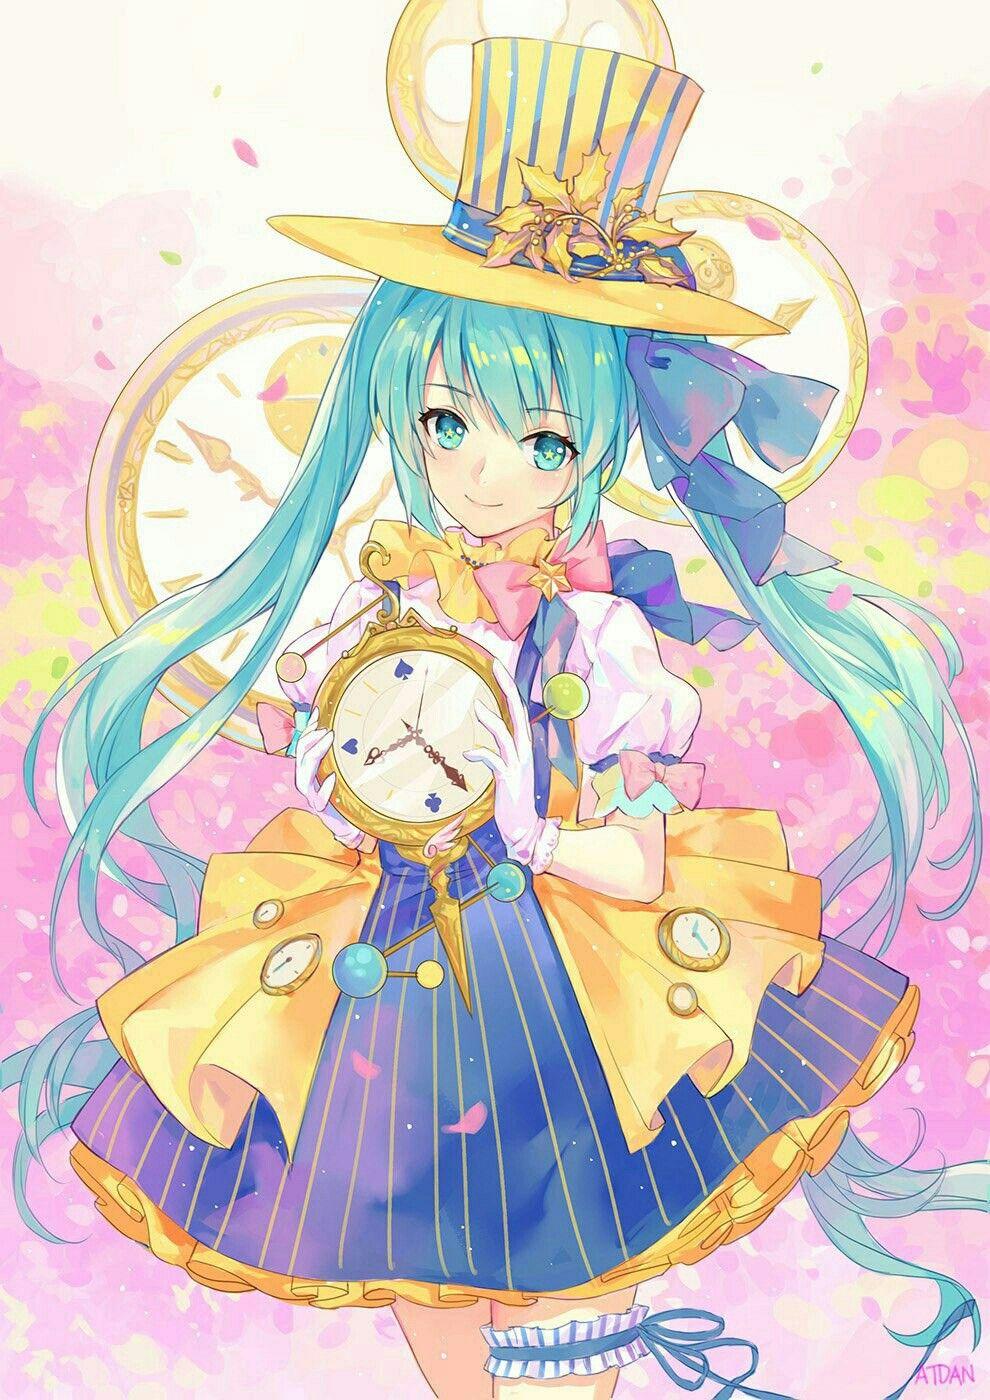 Anime, Art, Аниме, Hatsune Miku, Vocaloid Hatsune miku